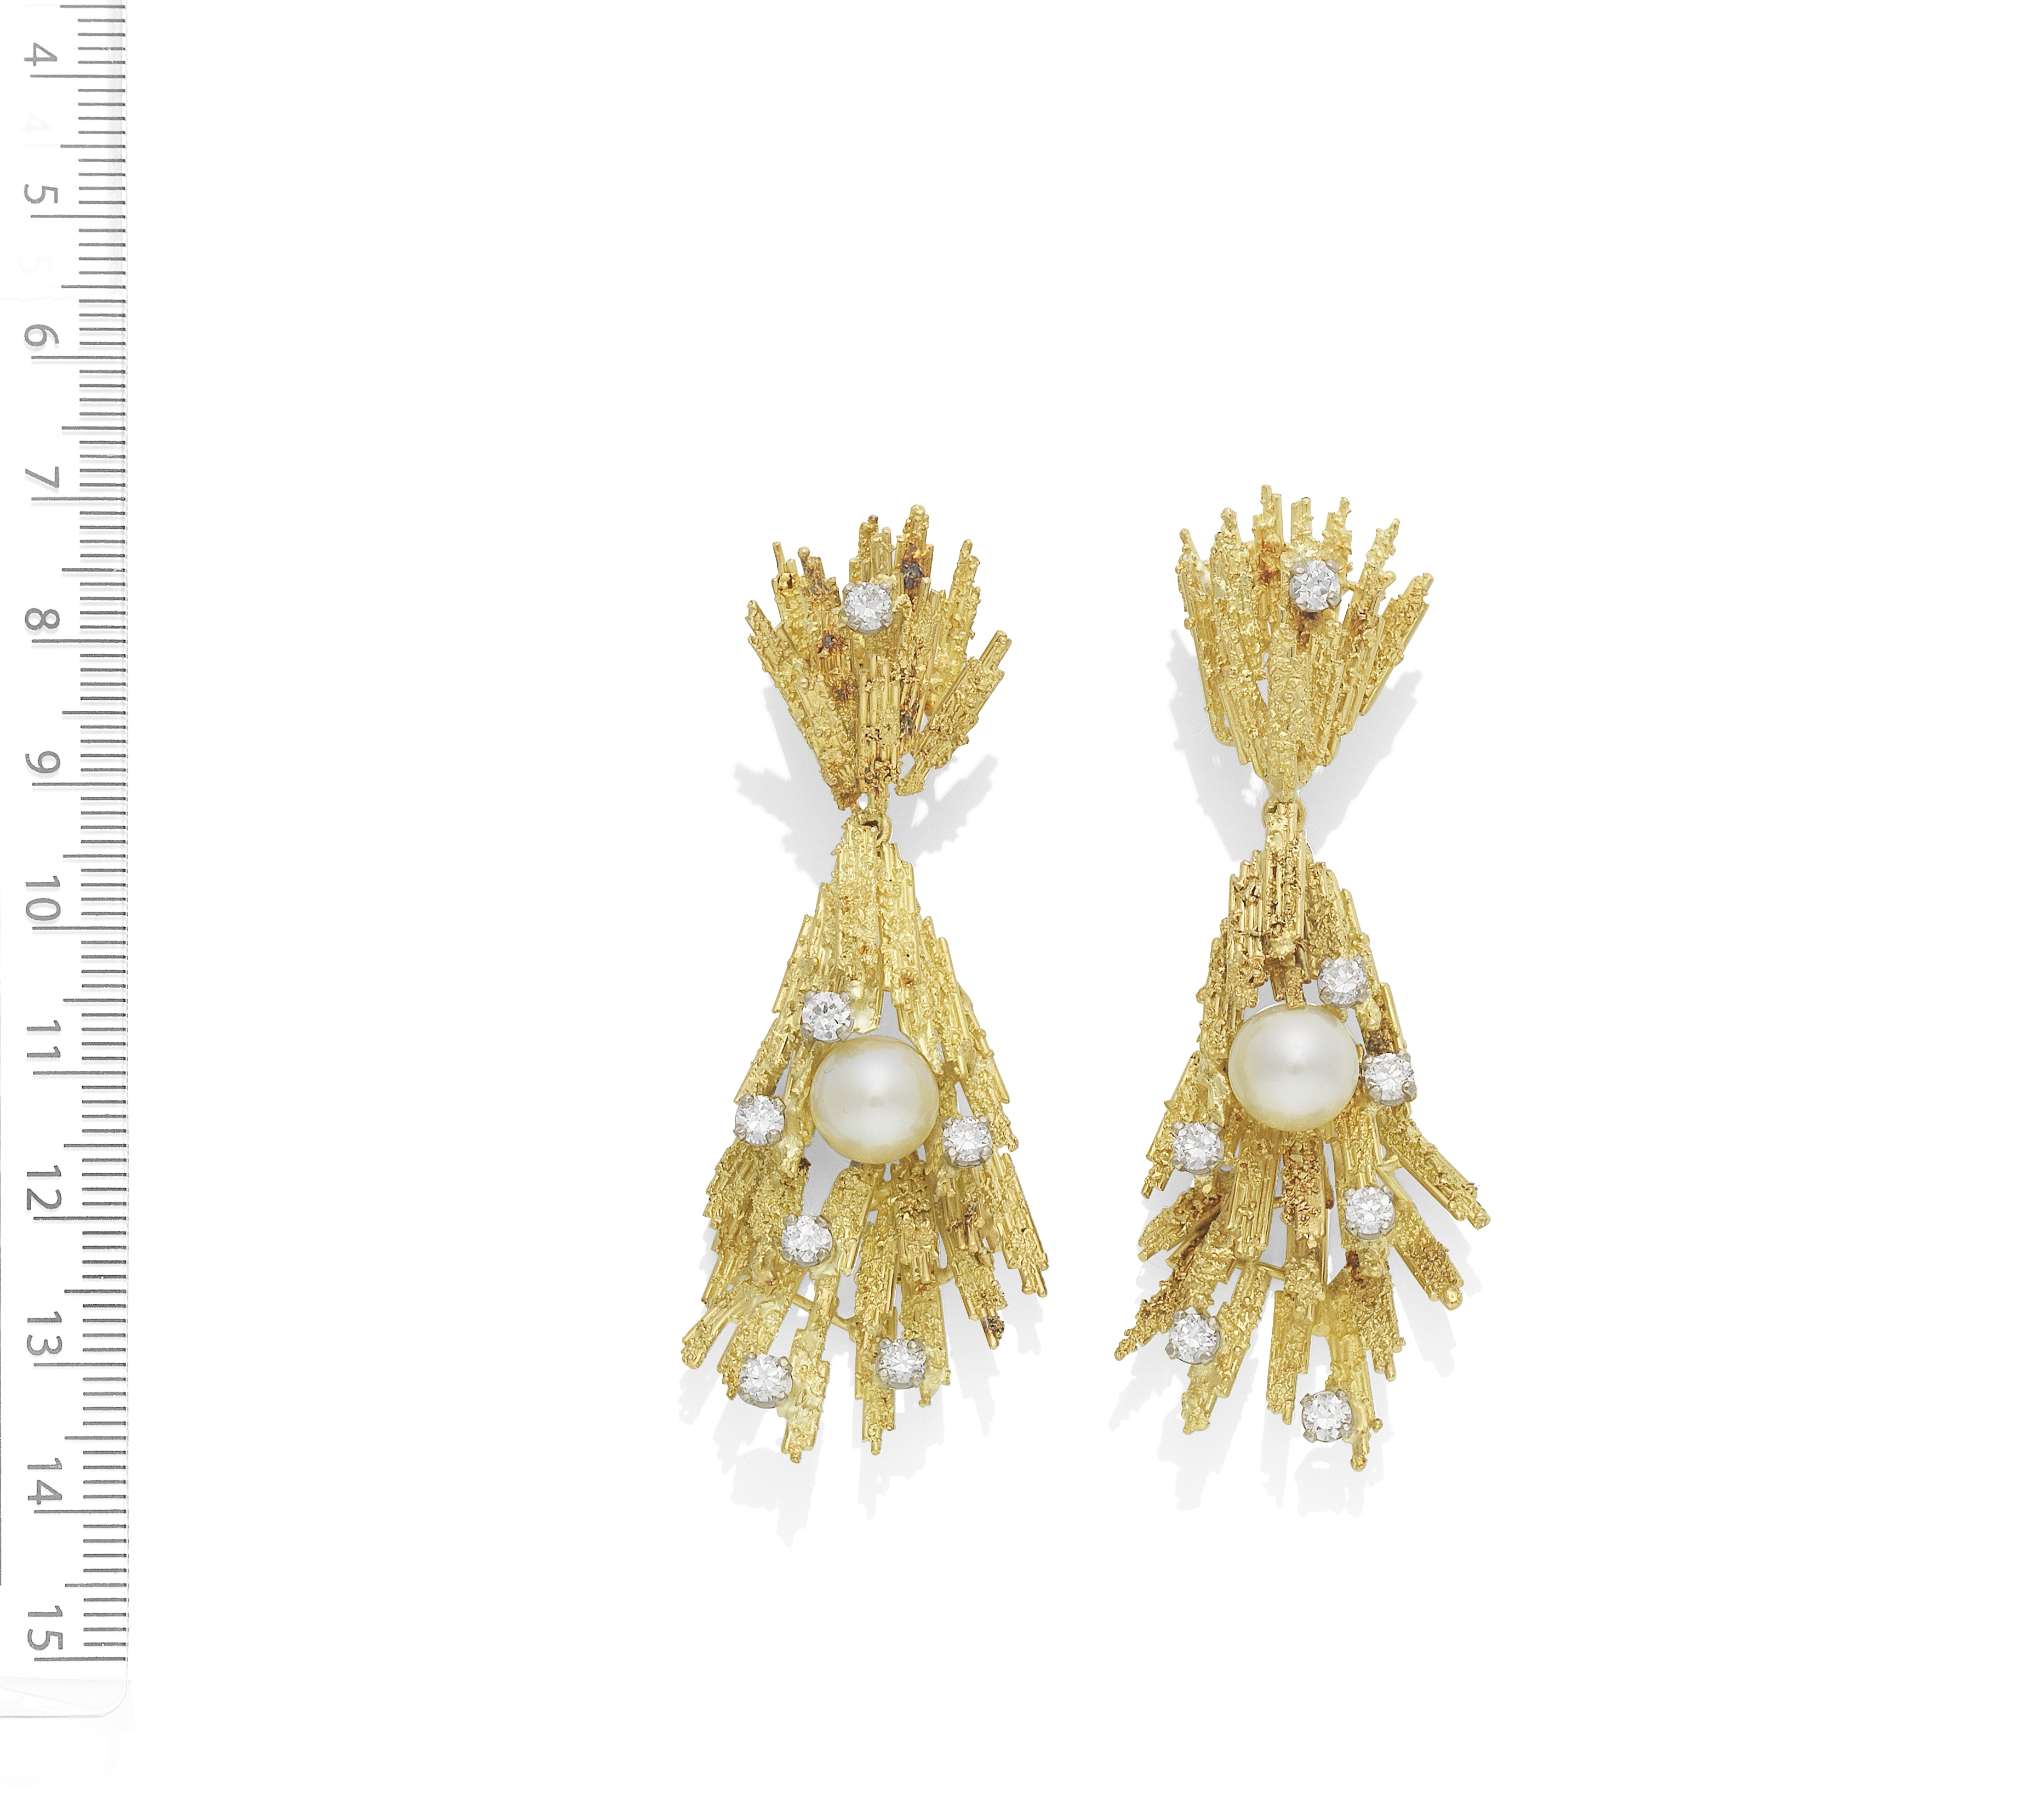 ALAN MARTIN GARD: CULTURED PEARL AND DIAMOND PENDENT EARRINGS, CIRCA 1970